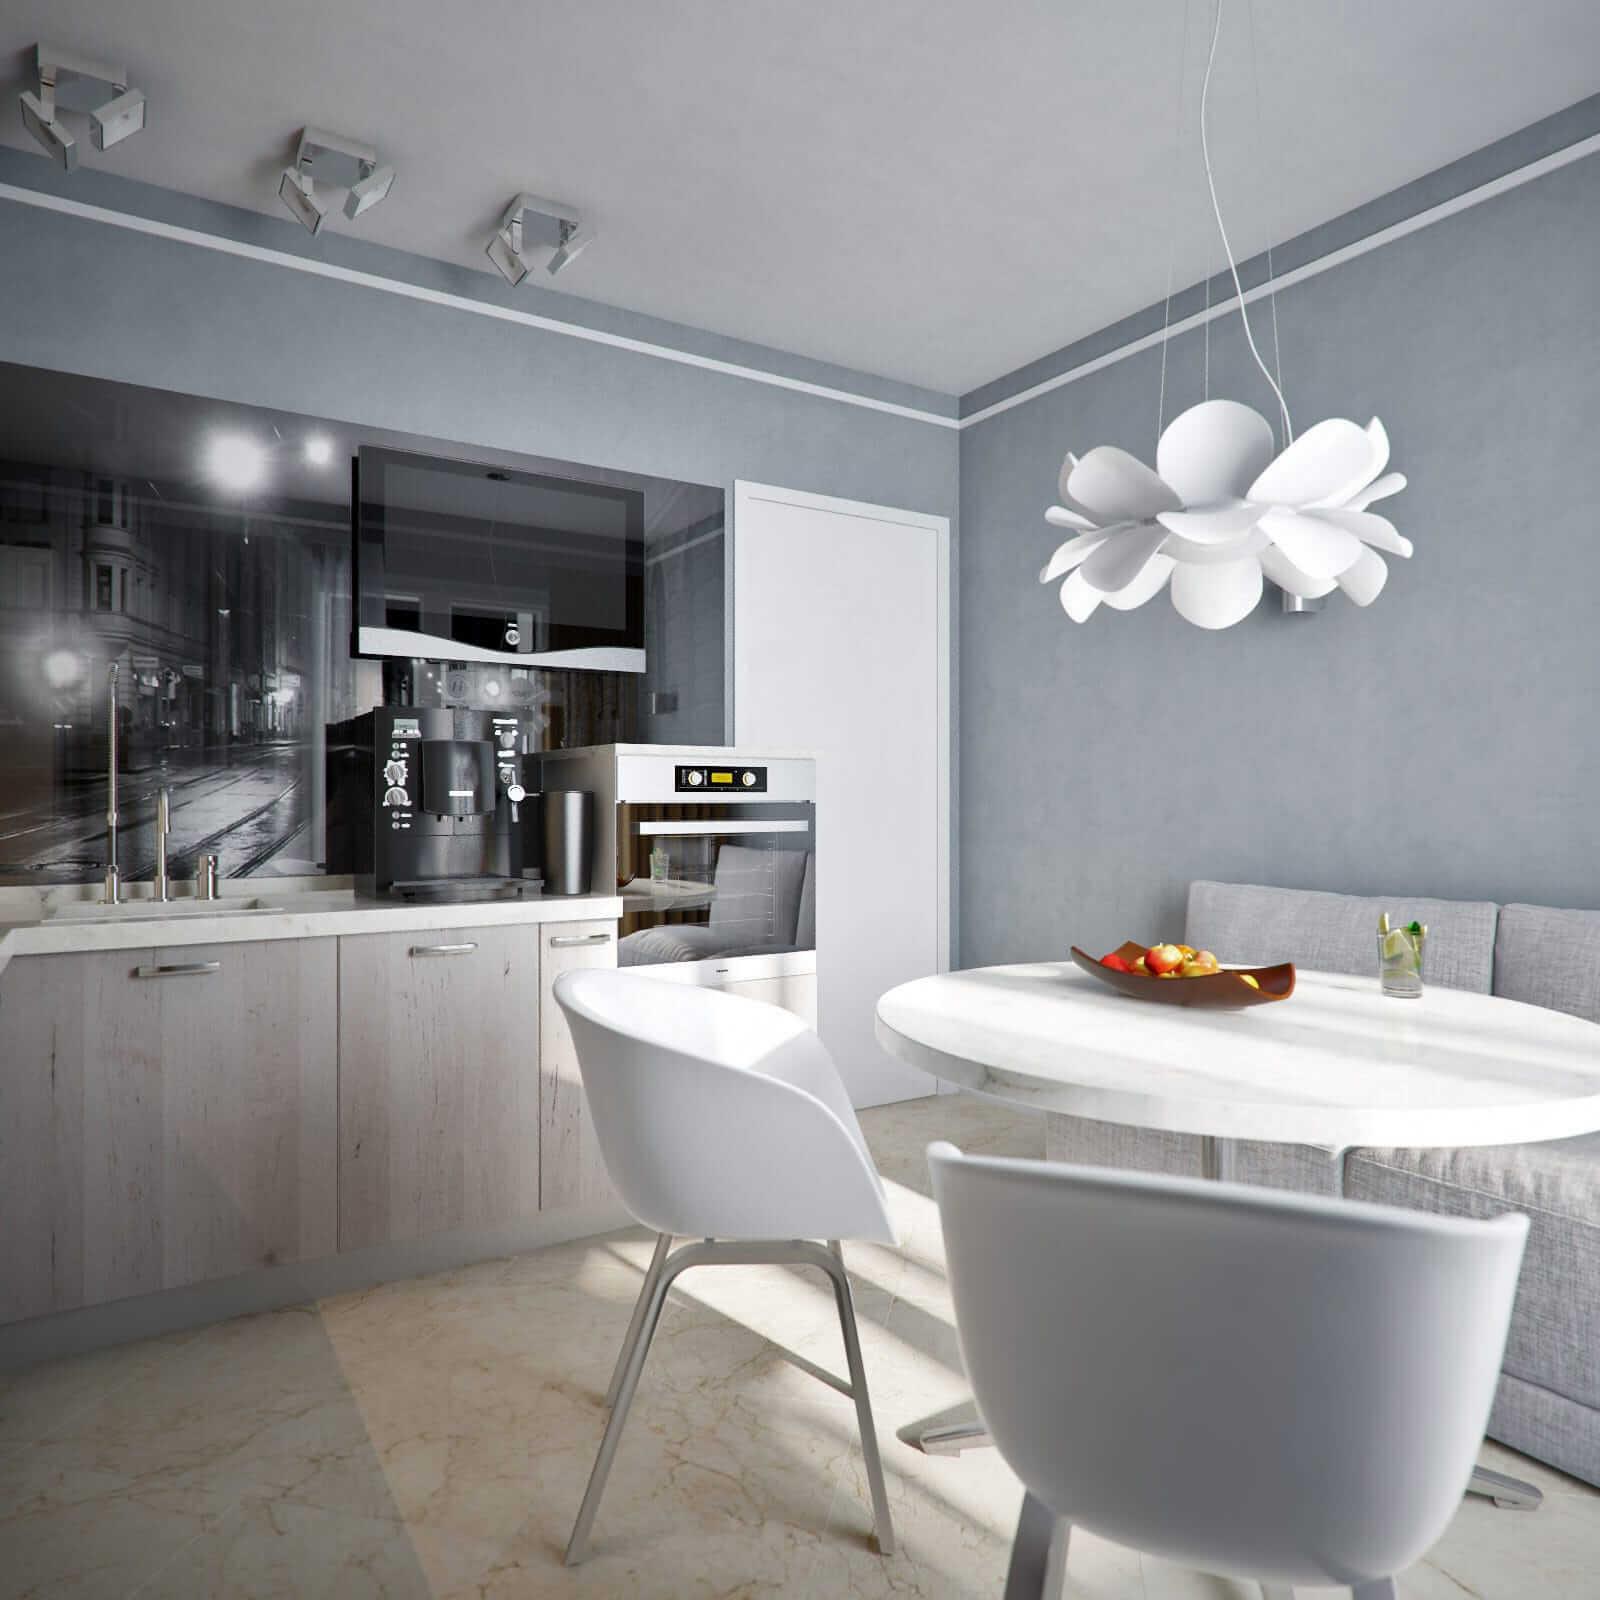 пример дизайн проекта однокомнатной квартиры